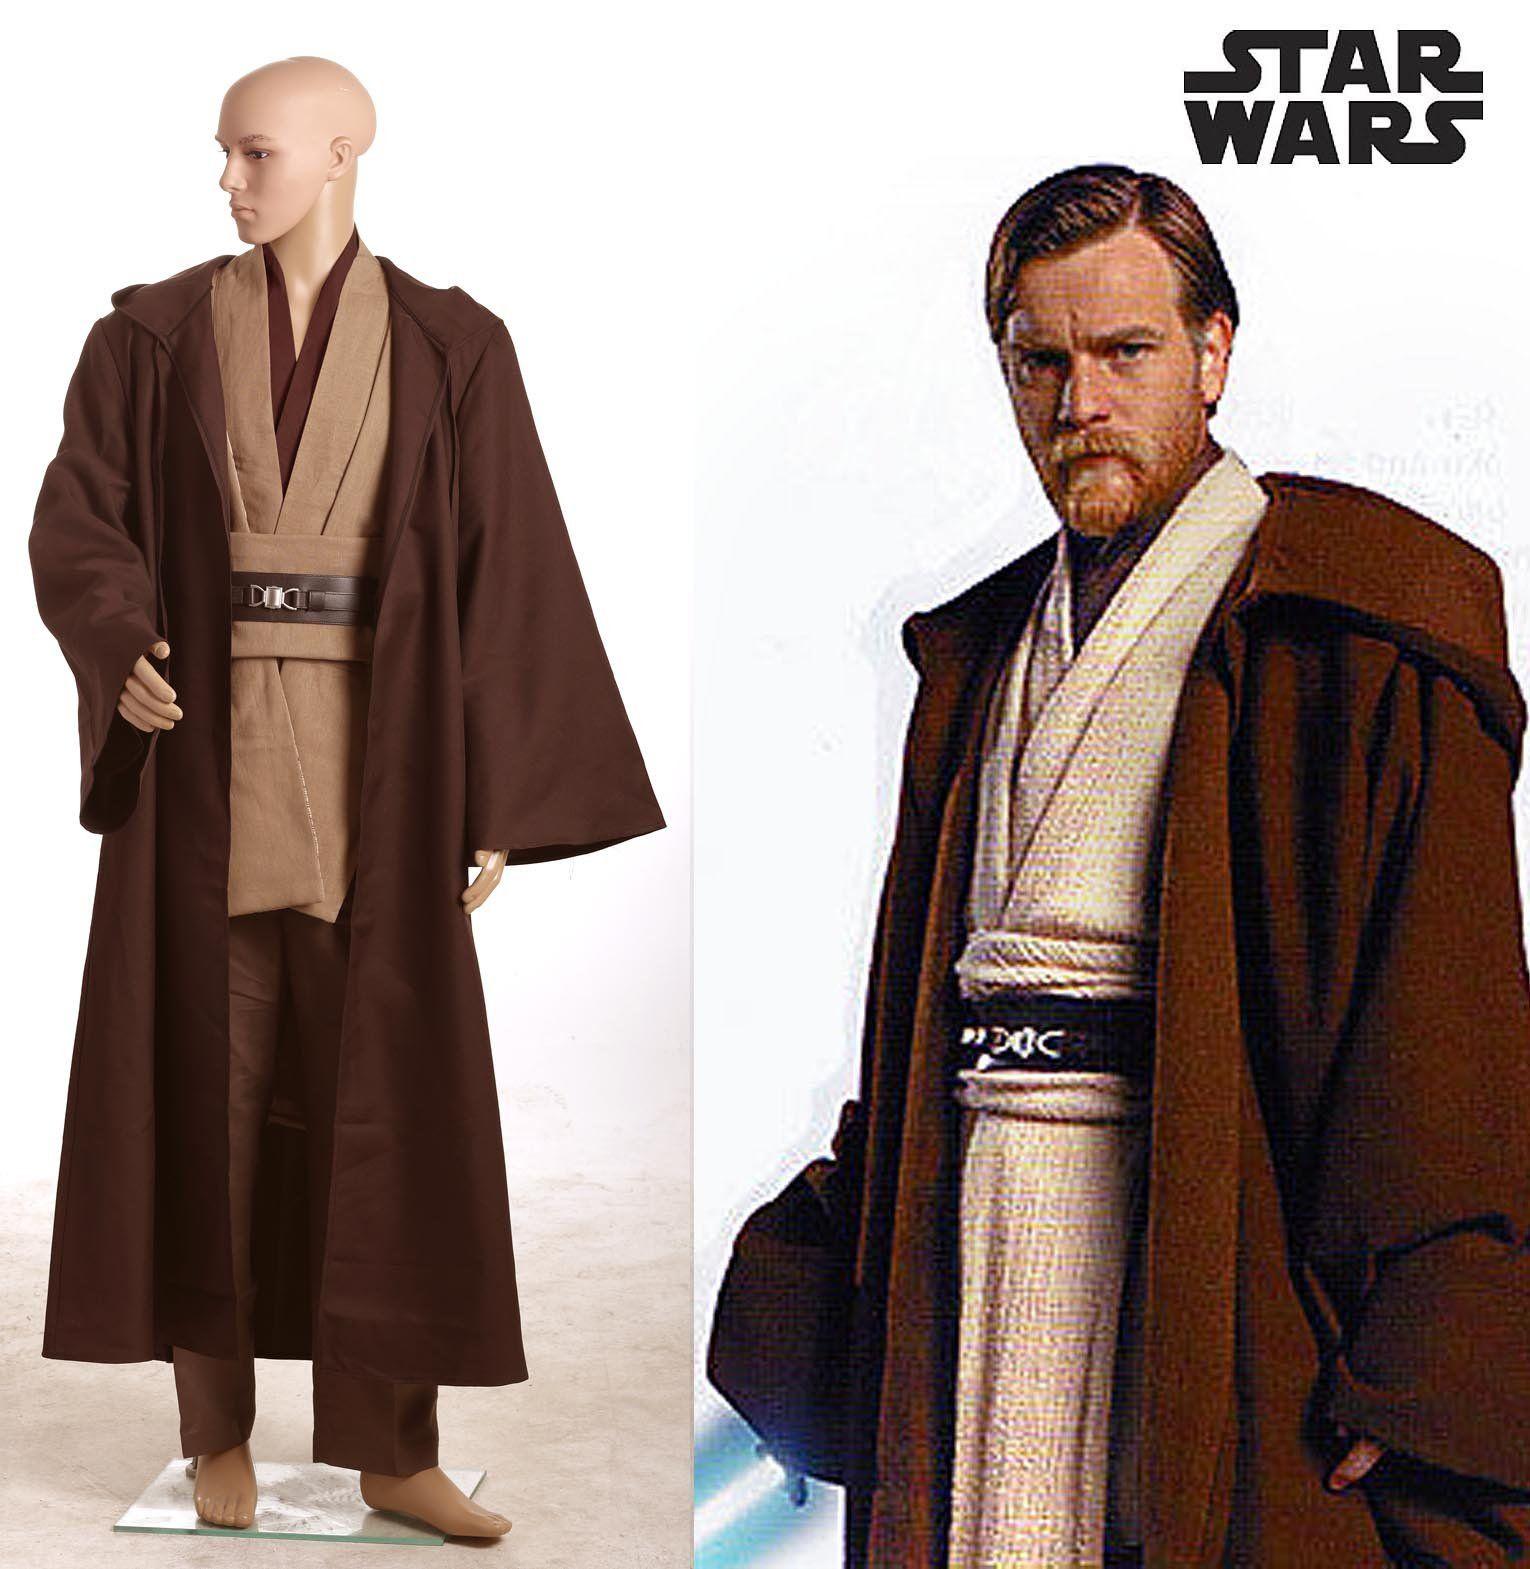 Star Wars Obi-Wan Kenobi Jedi TUNIC neue Version Cosplay Kostüm ...